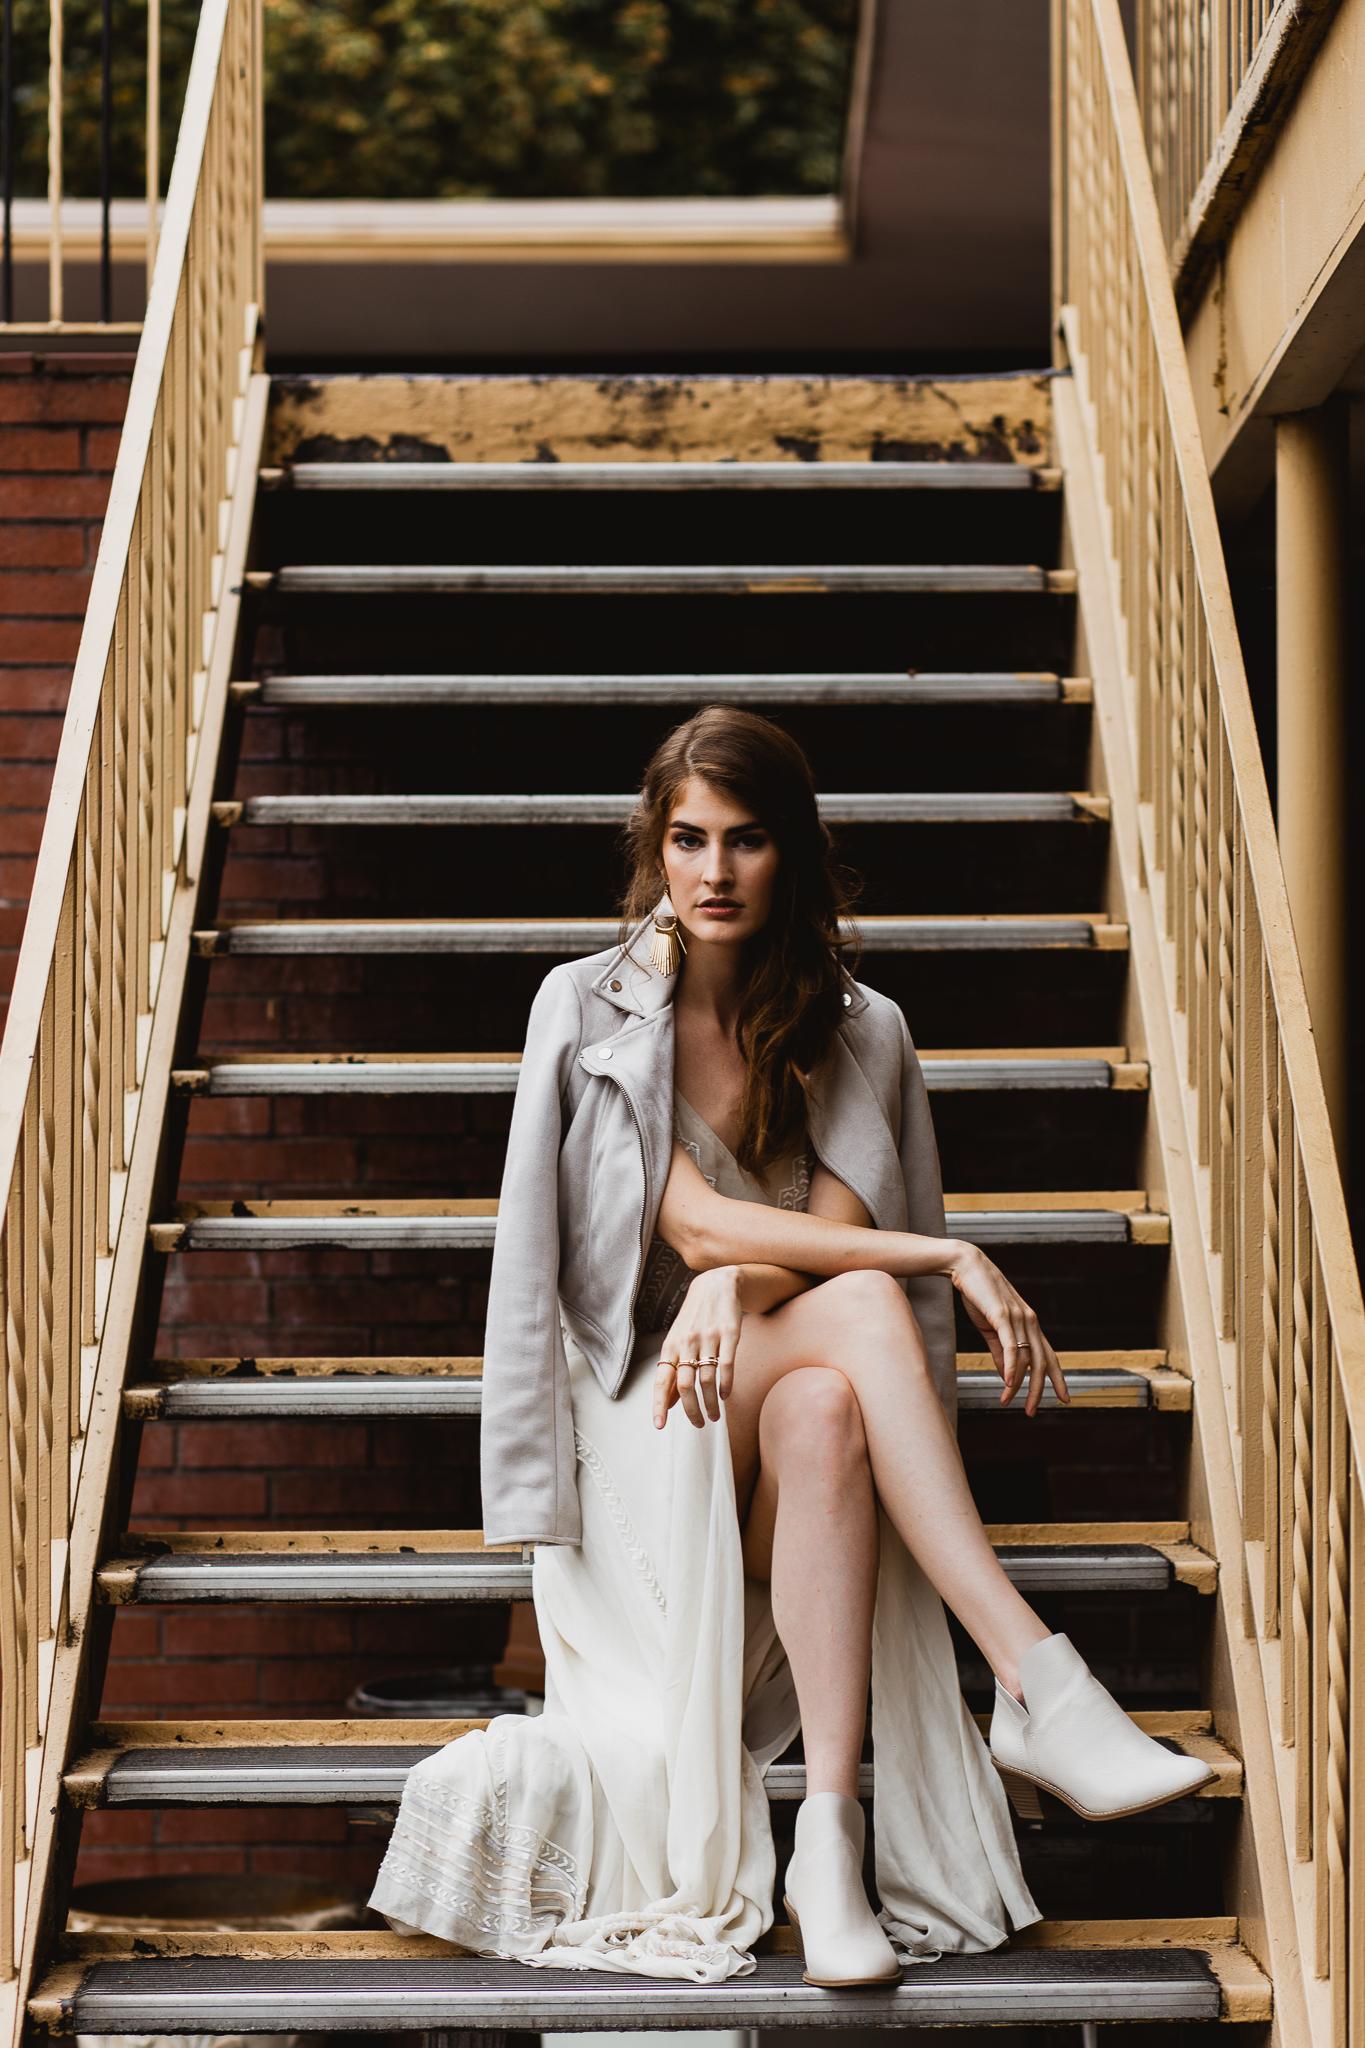 Amy - Bridal Styled Shoot - Vancouver WA - Malina Rose Photography small --7.jpg